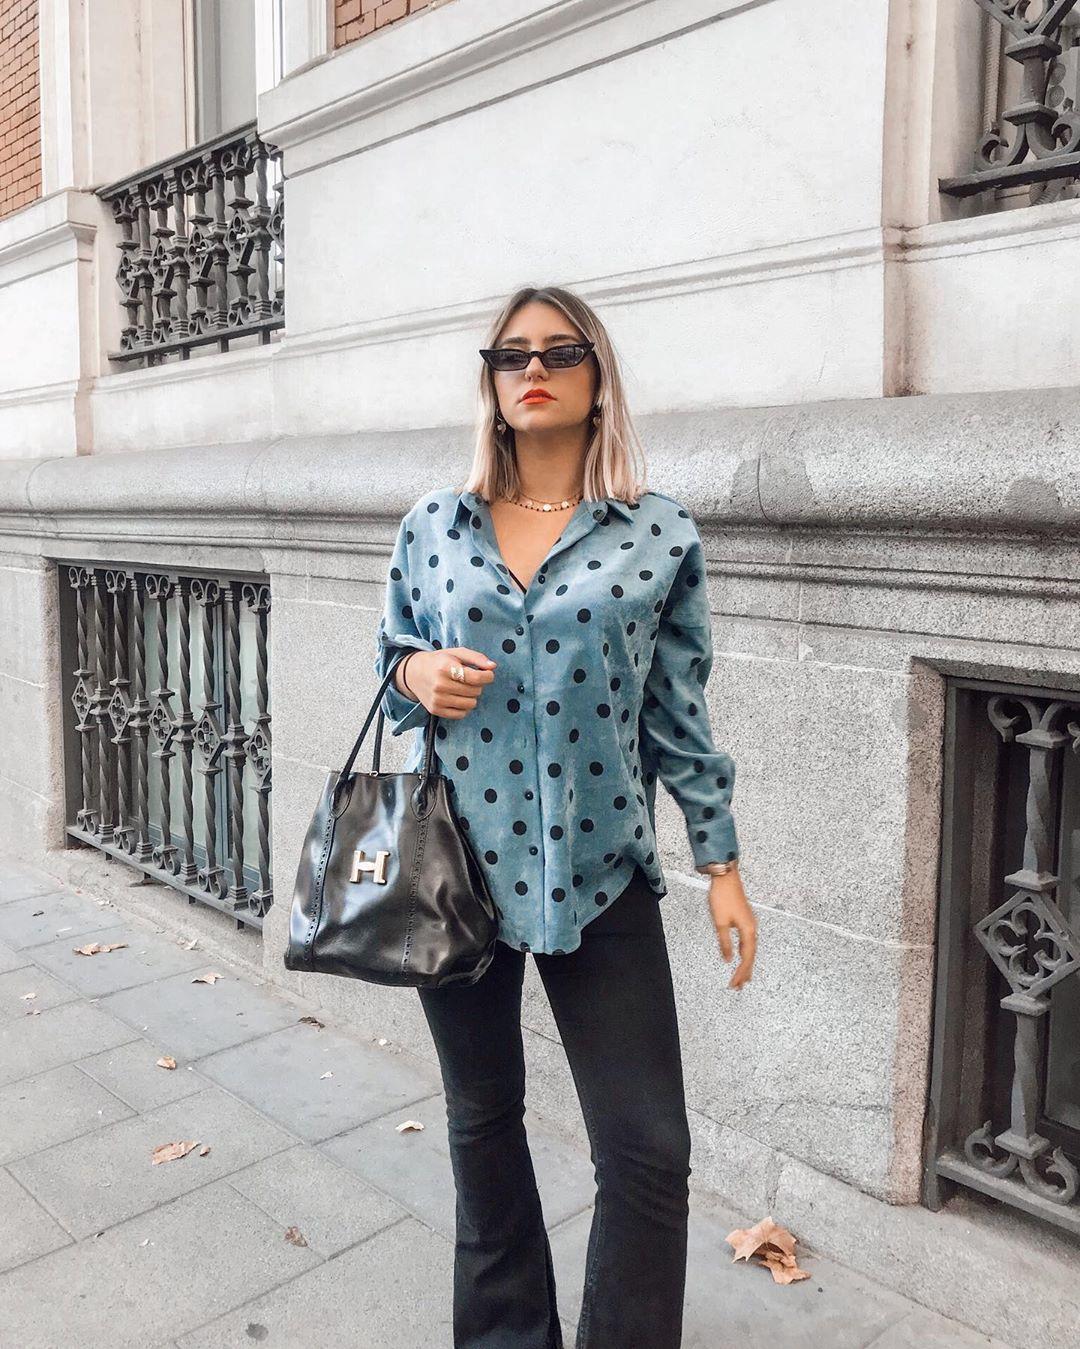 fine corduroy printed shirt de Zara sur lucia_pg